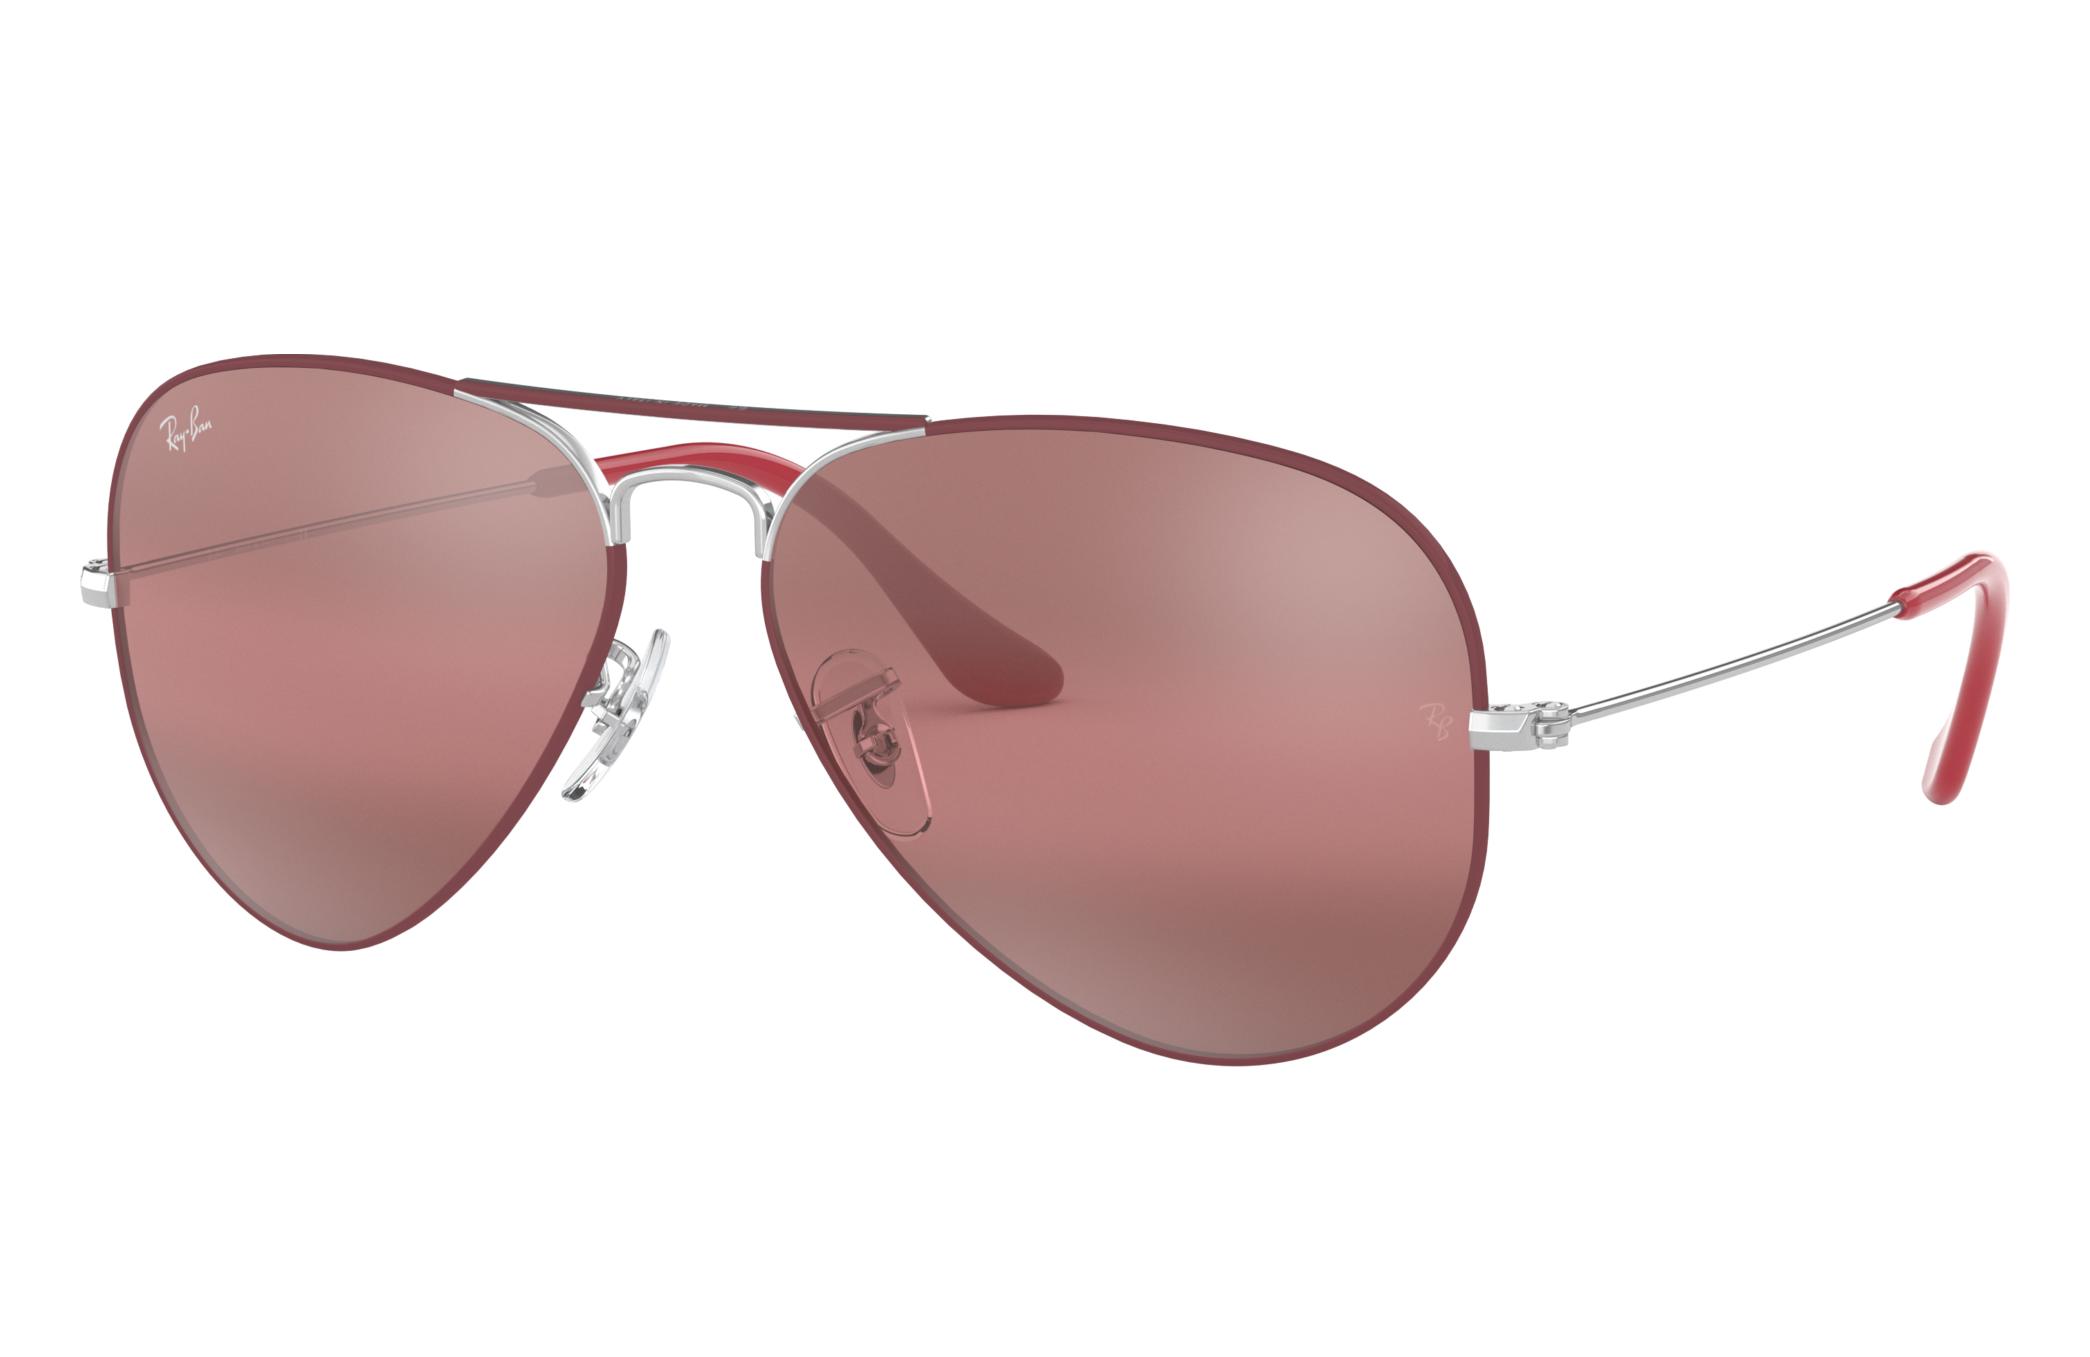 Ray-Ban Aviator Mirror Silver, Violet Lenses - RB3025